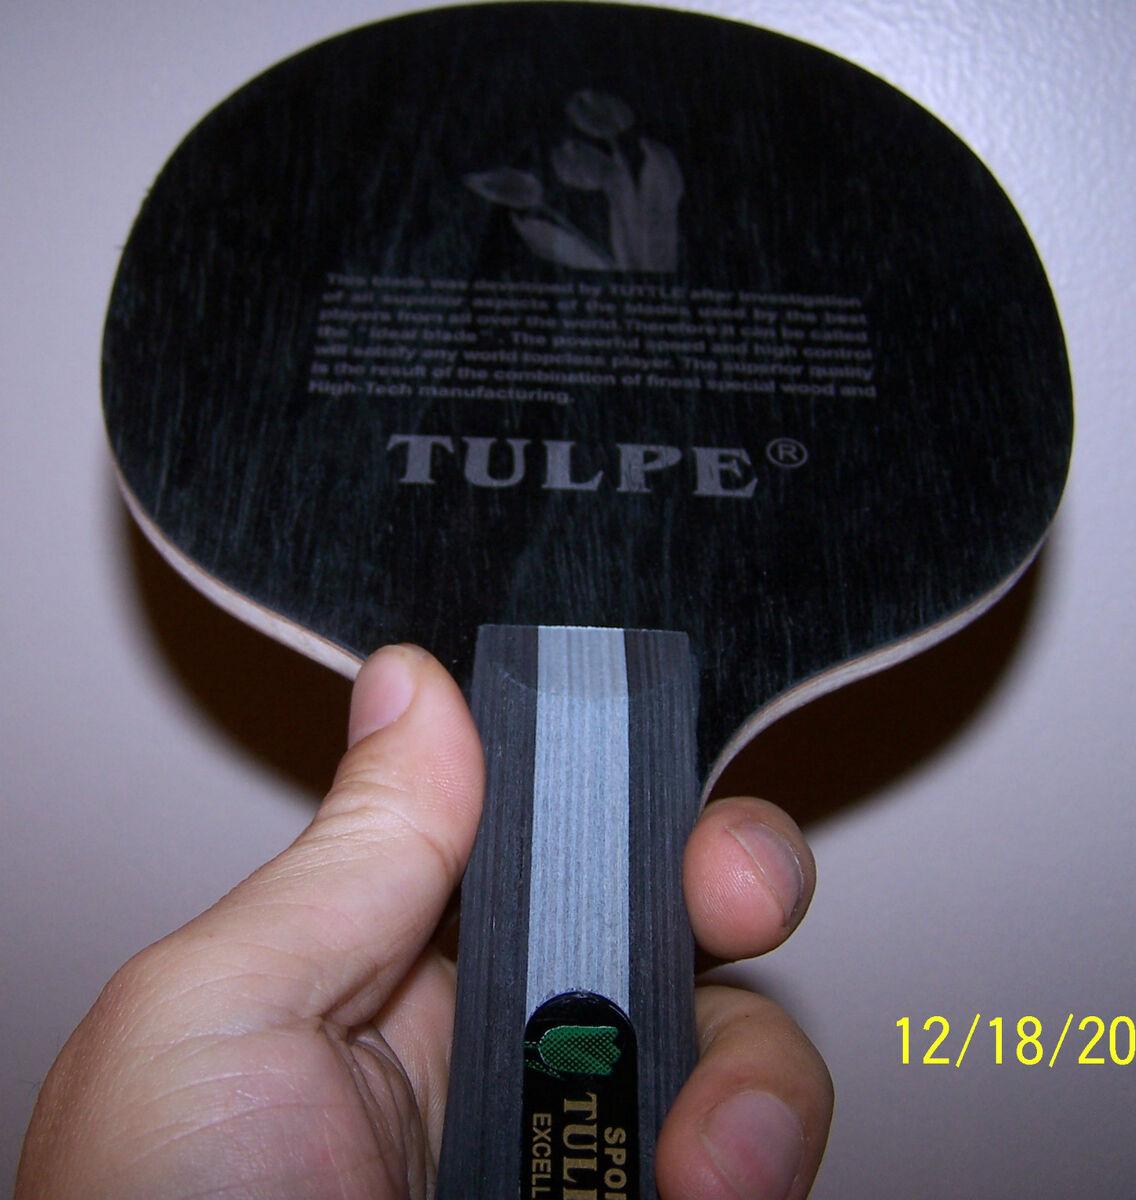 German TULPE Hinoki Blade Table Tennis Ping Pong 424